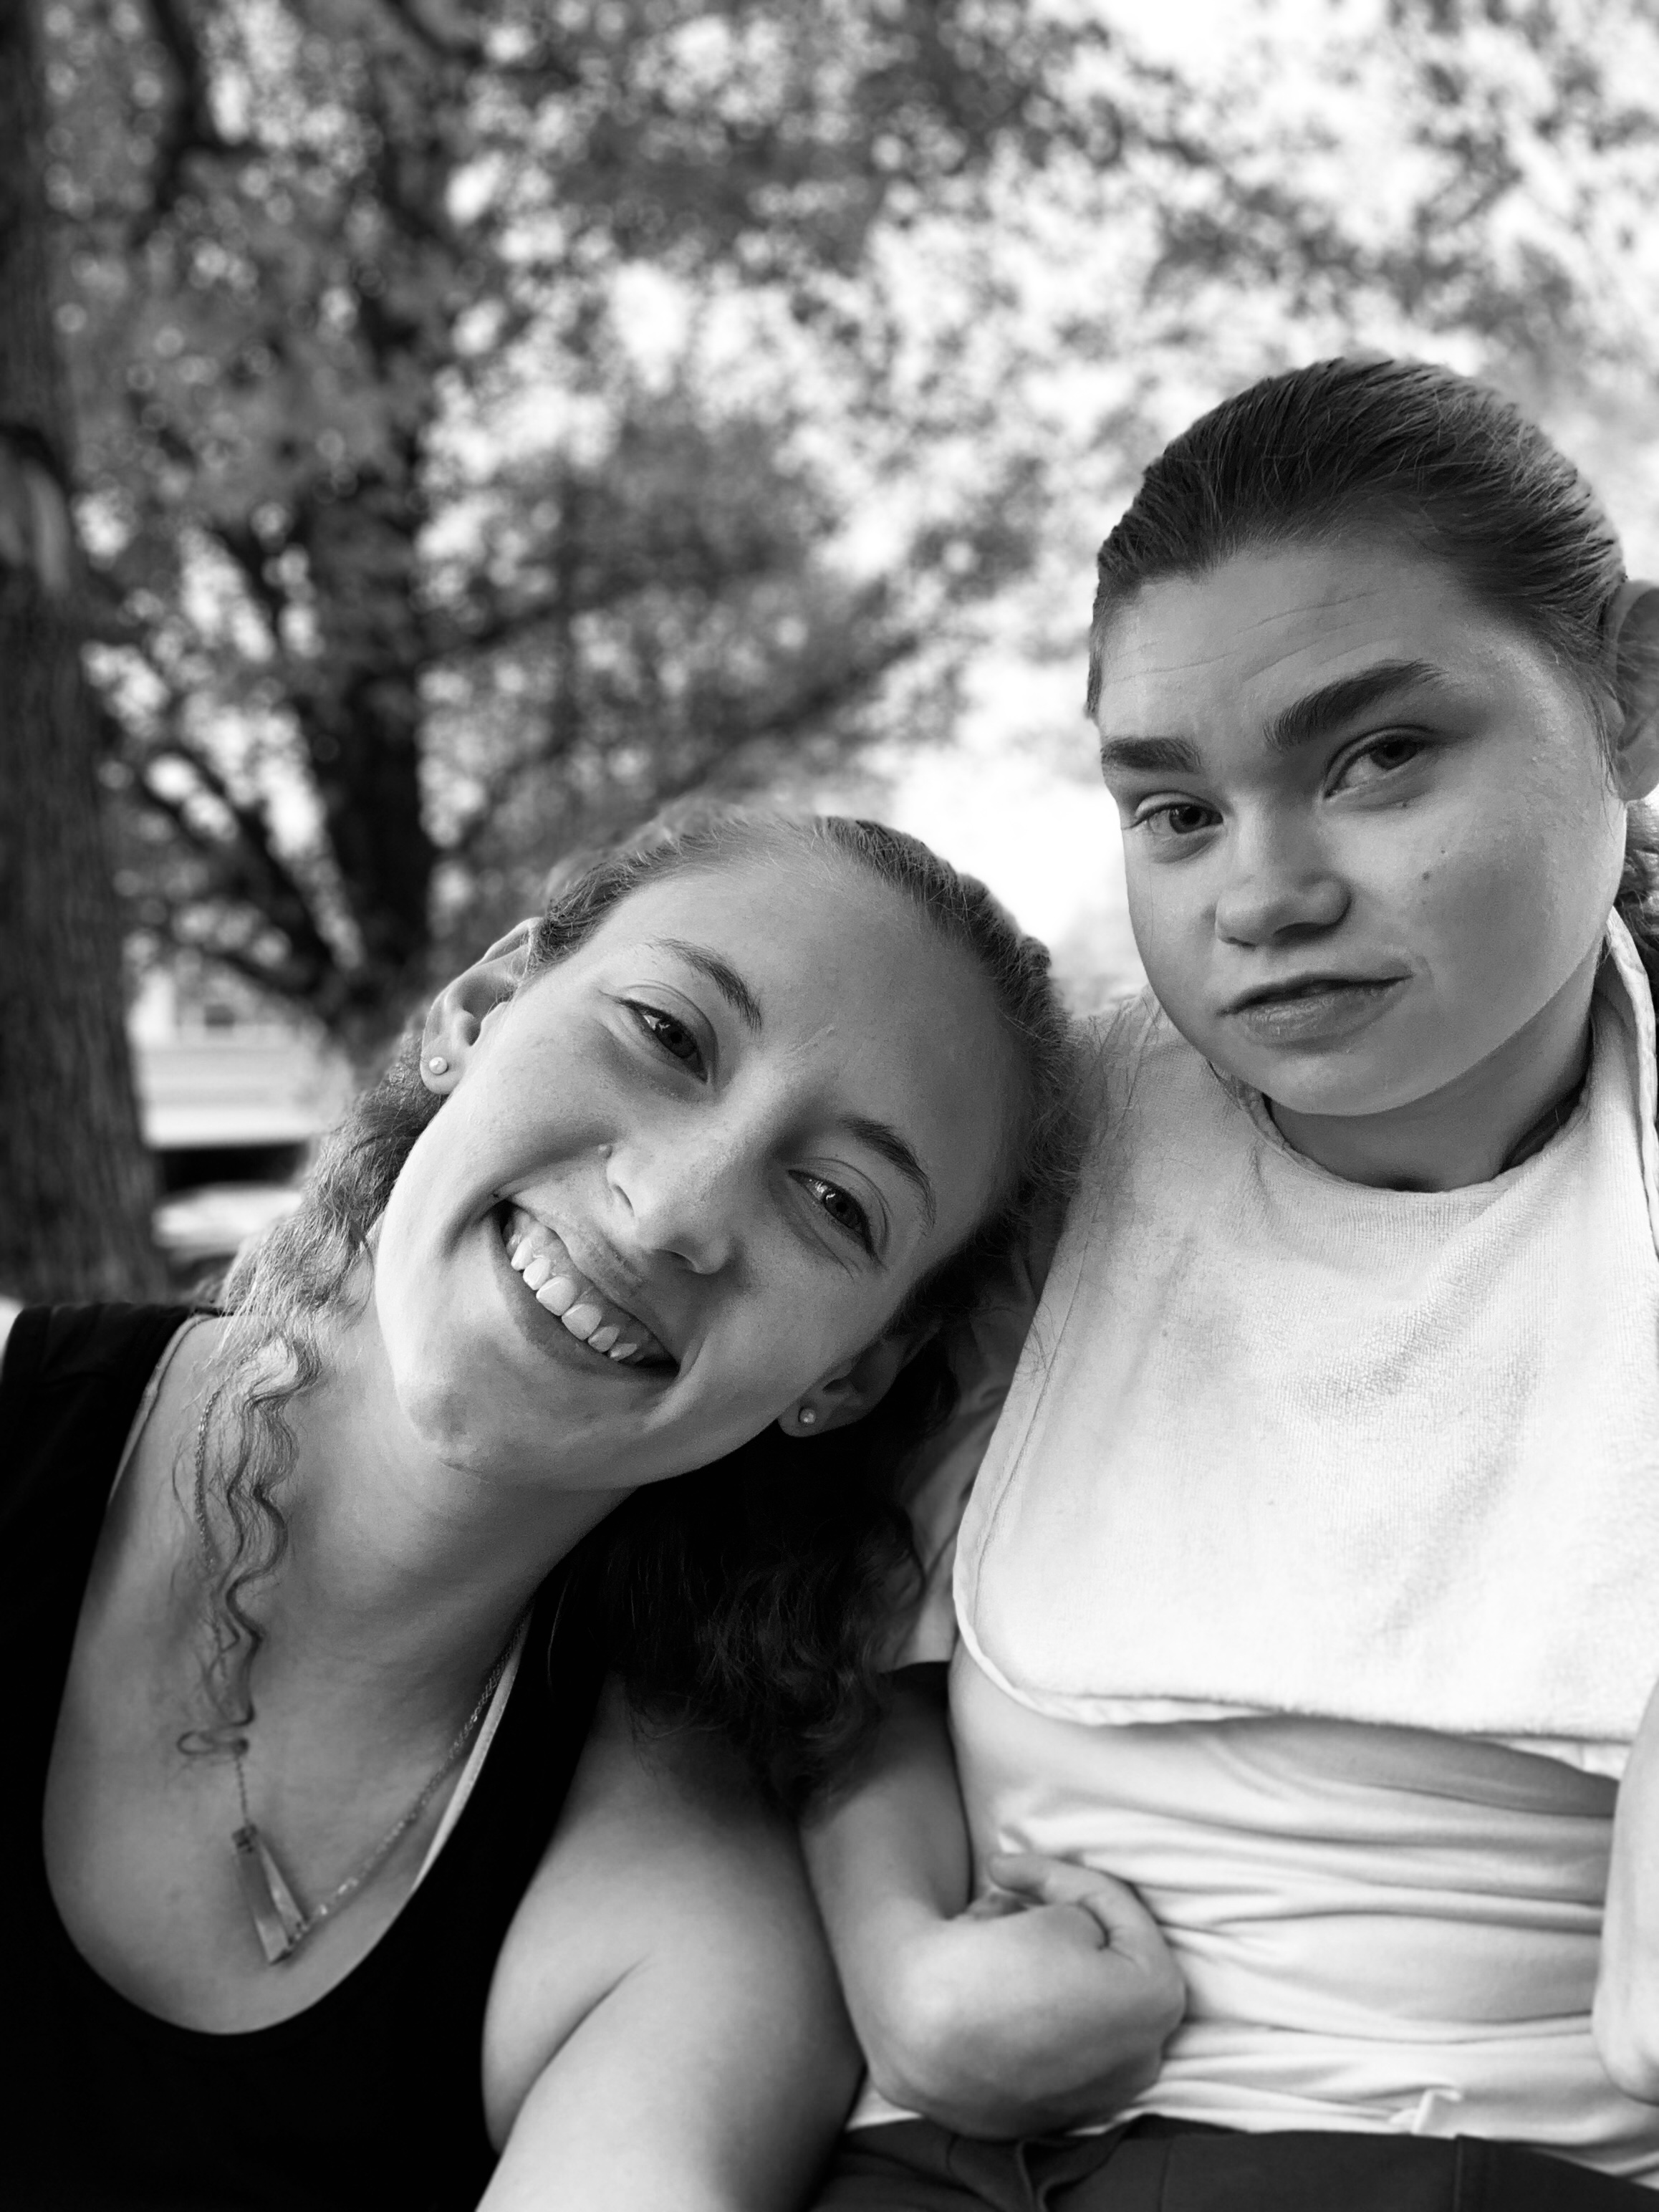 Amy and Kyia smiling at camera